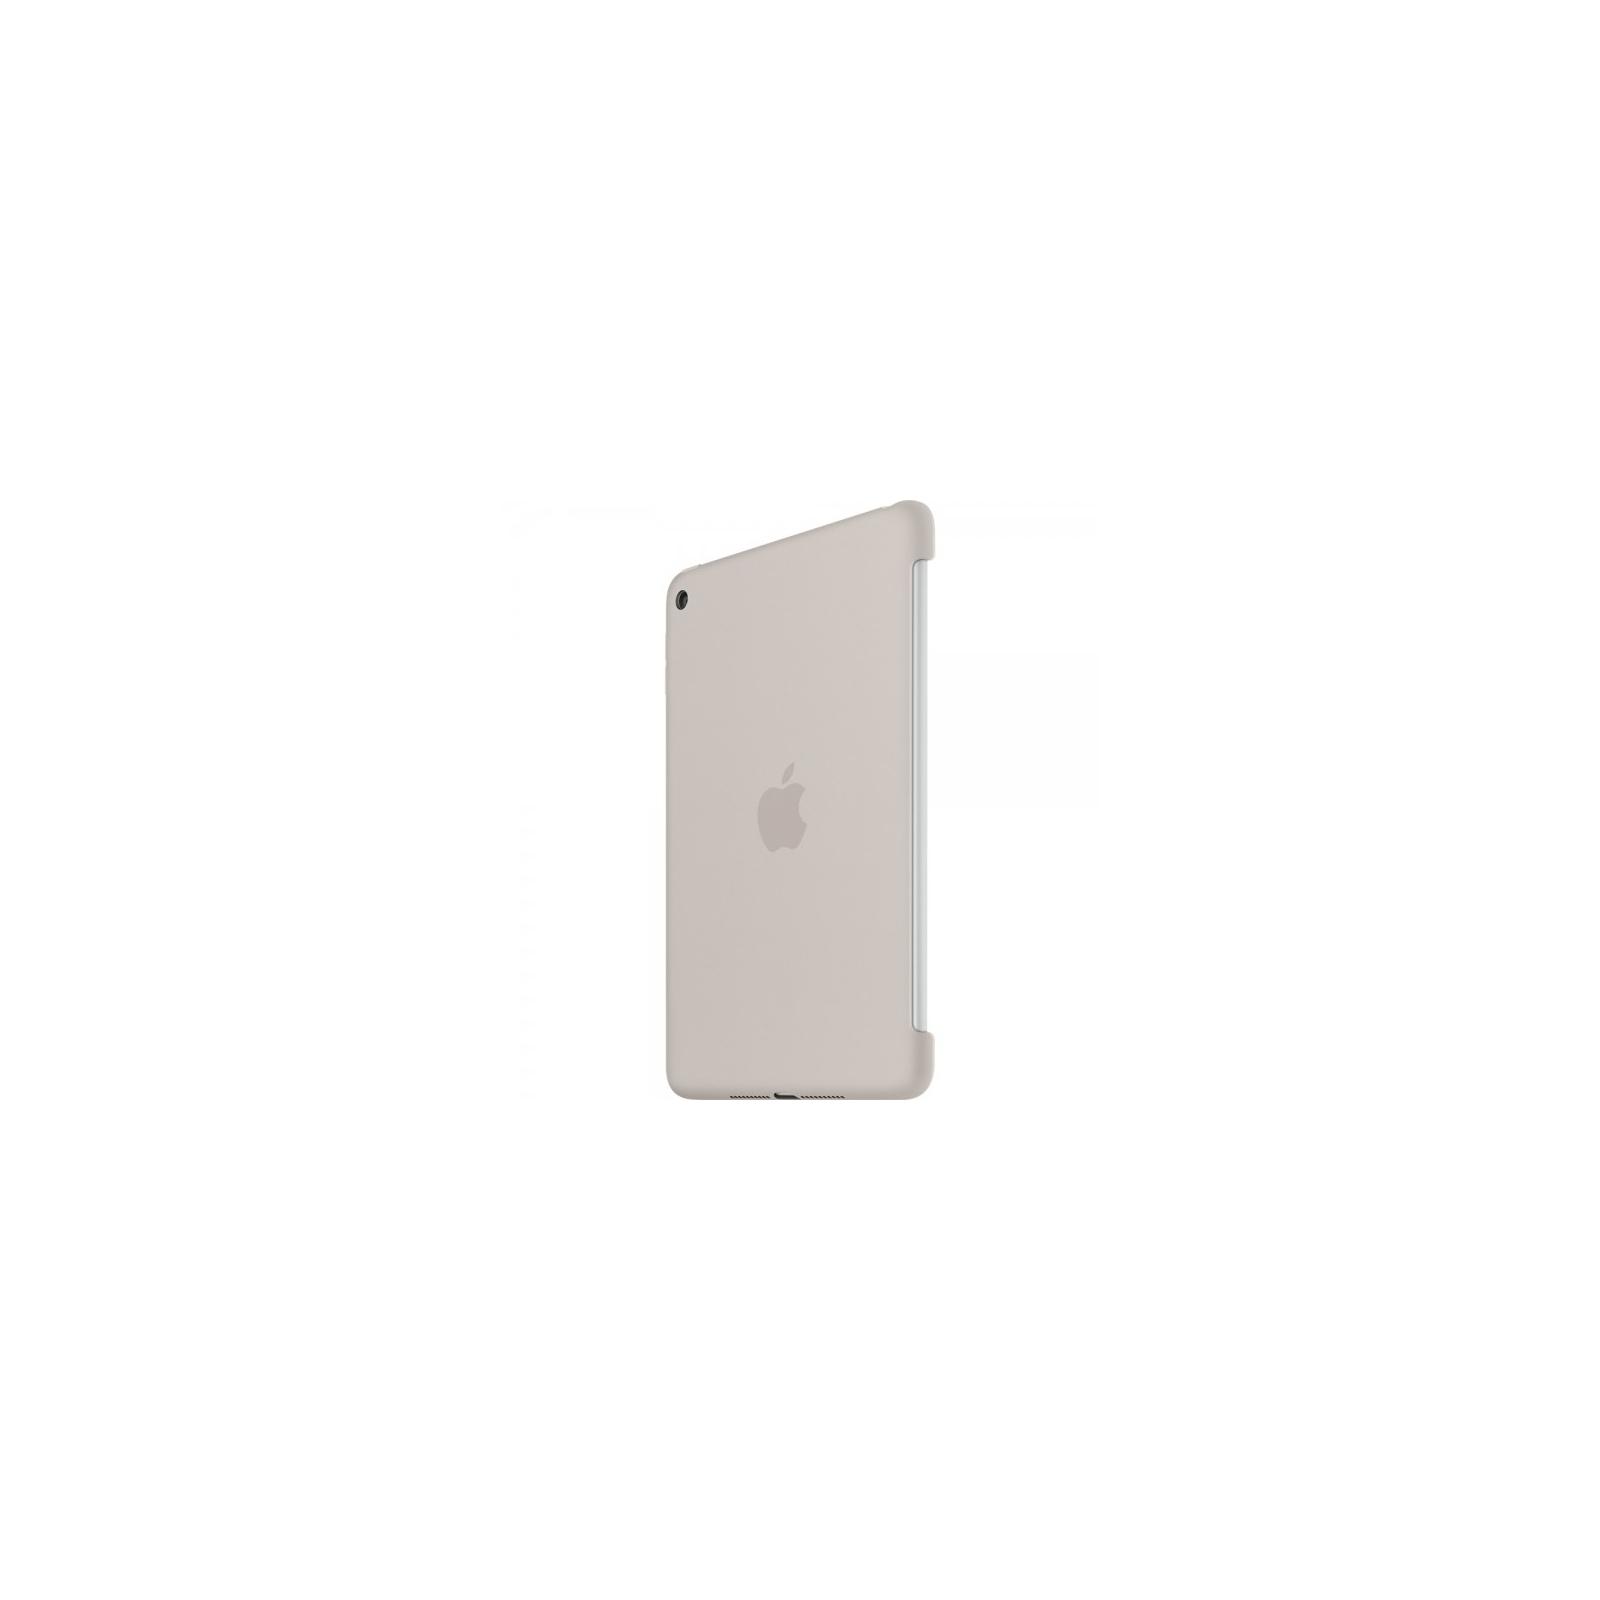 Чехол для планшета Apple iPad mini 4 Stone (MKLP2ZM/A) изображение 2